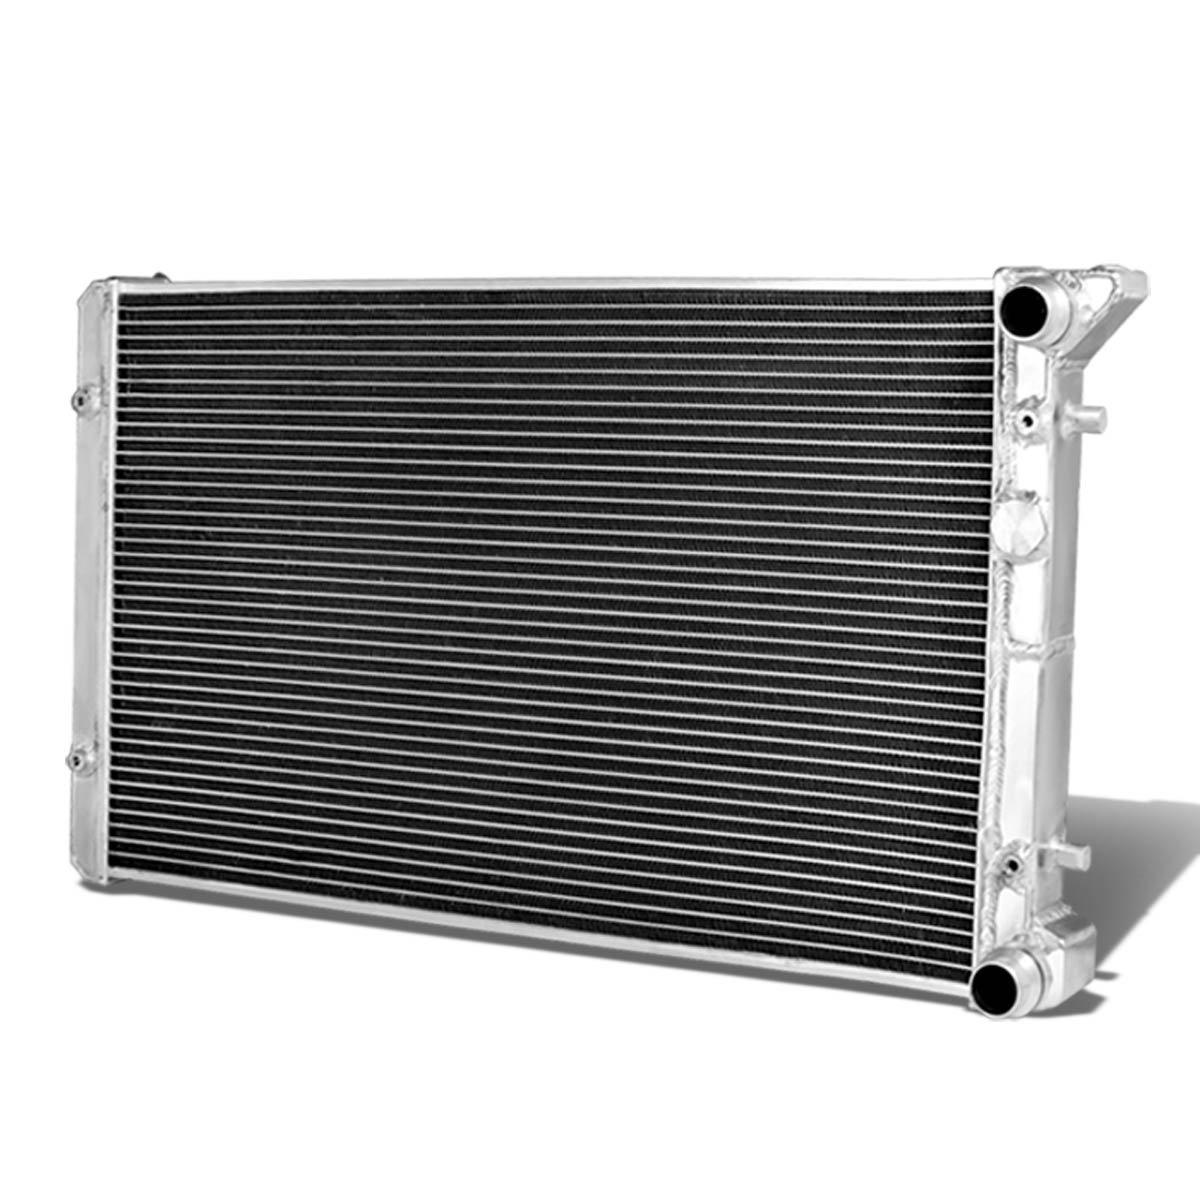 DNA Motoring RA-VWGOLF99-2 2-Row Full Aluminum Radiator